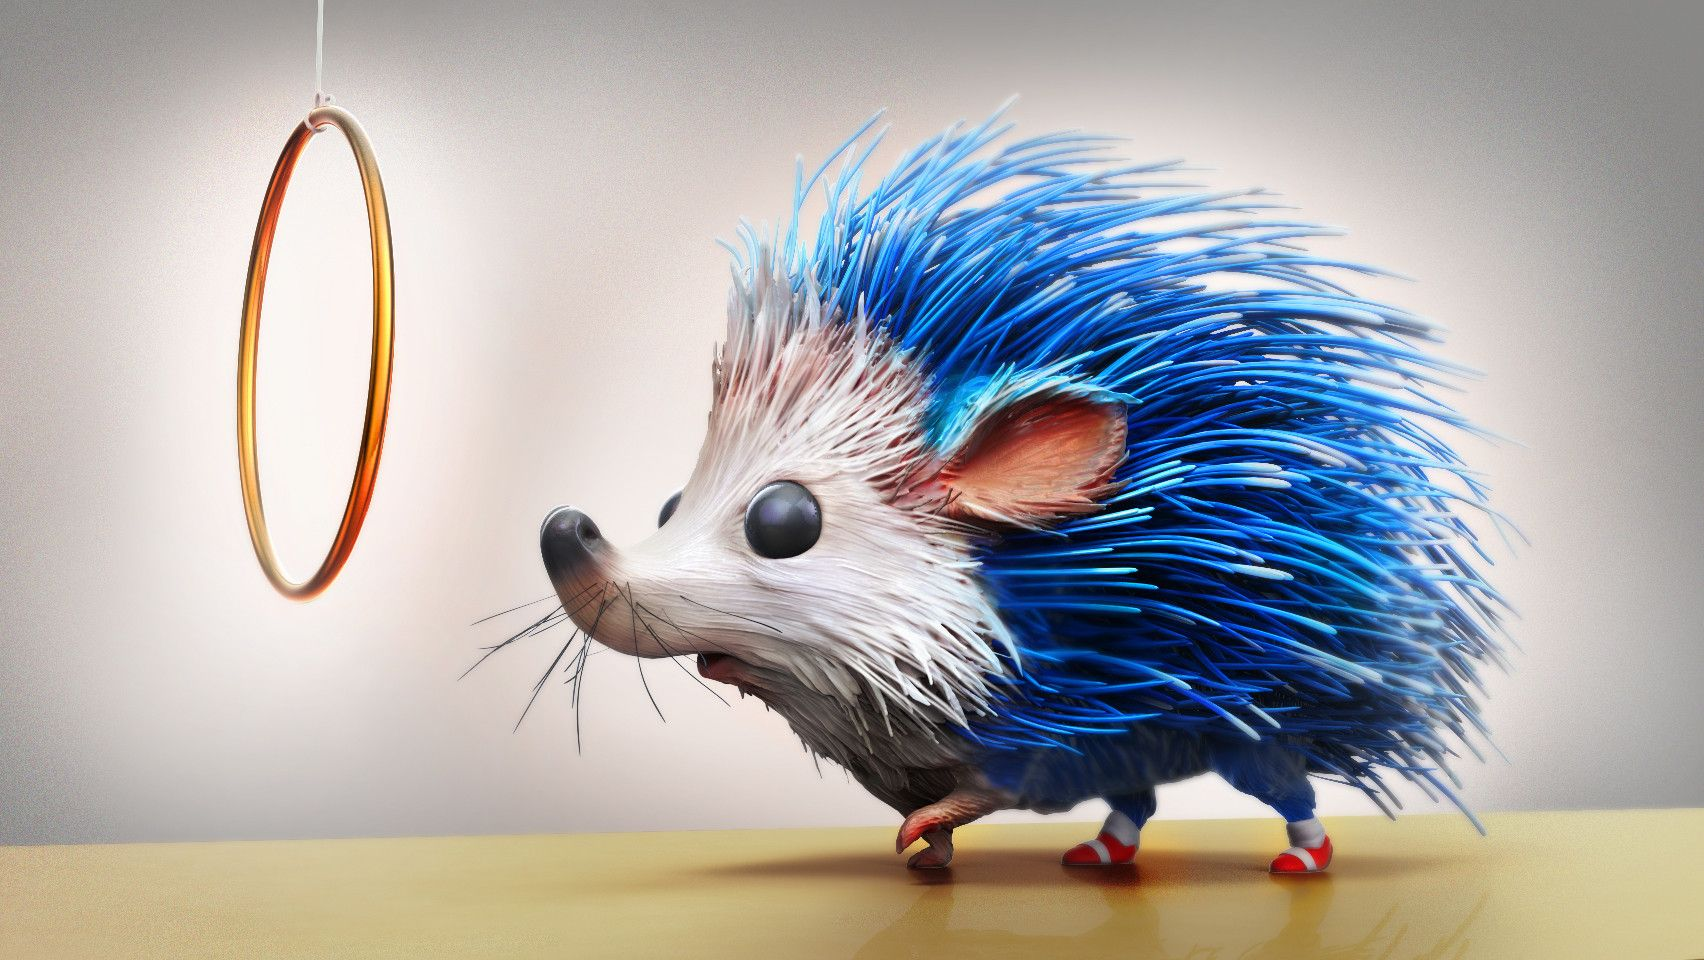 ArtStation Sonic the real Hedgehog, 3d conversion